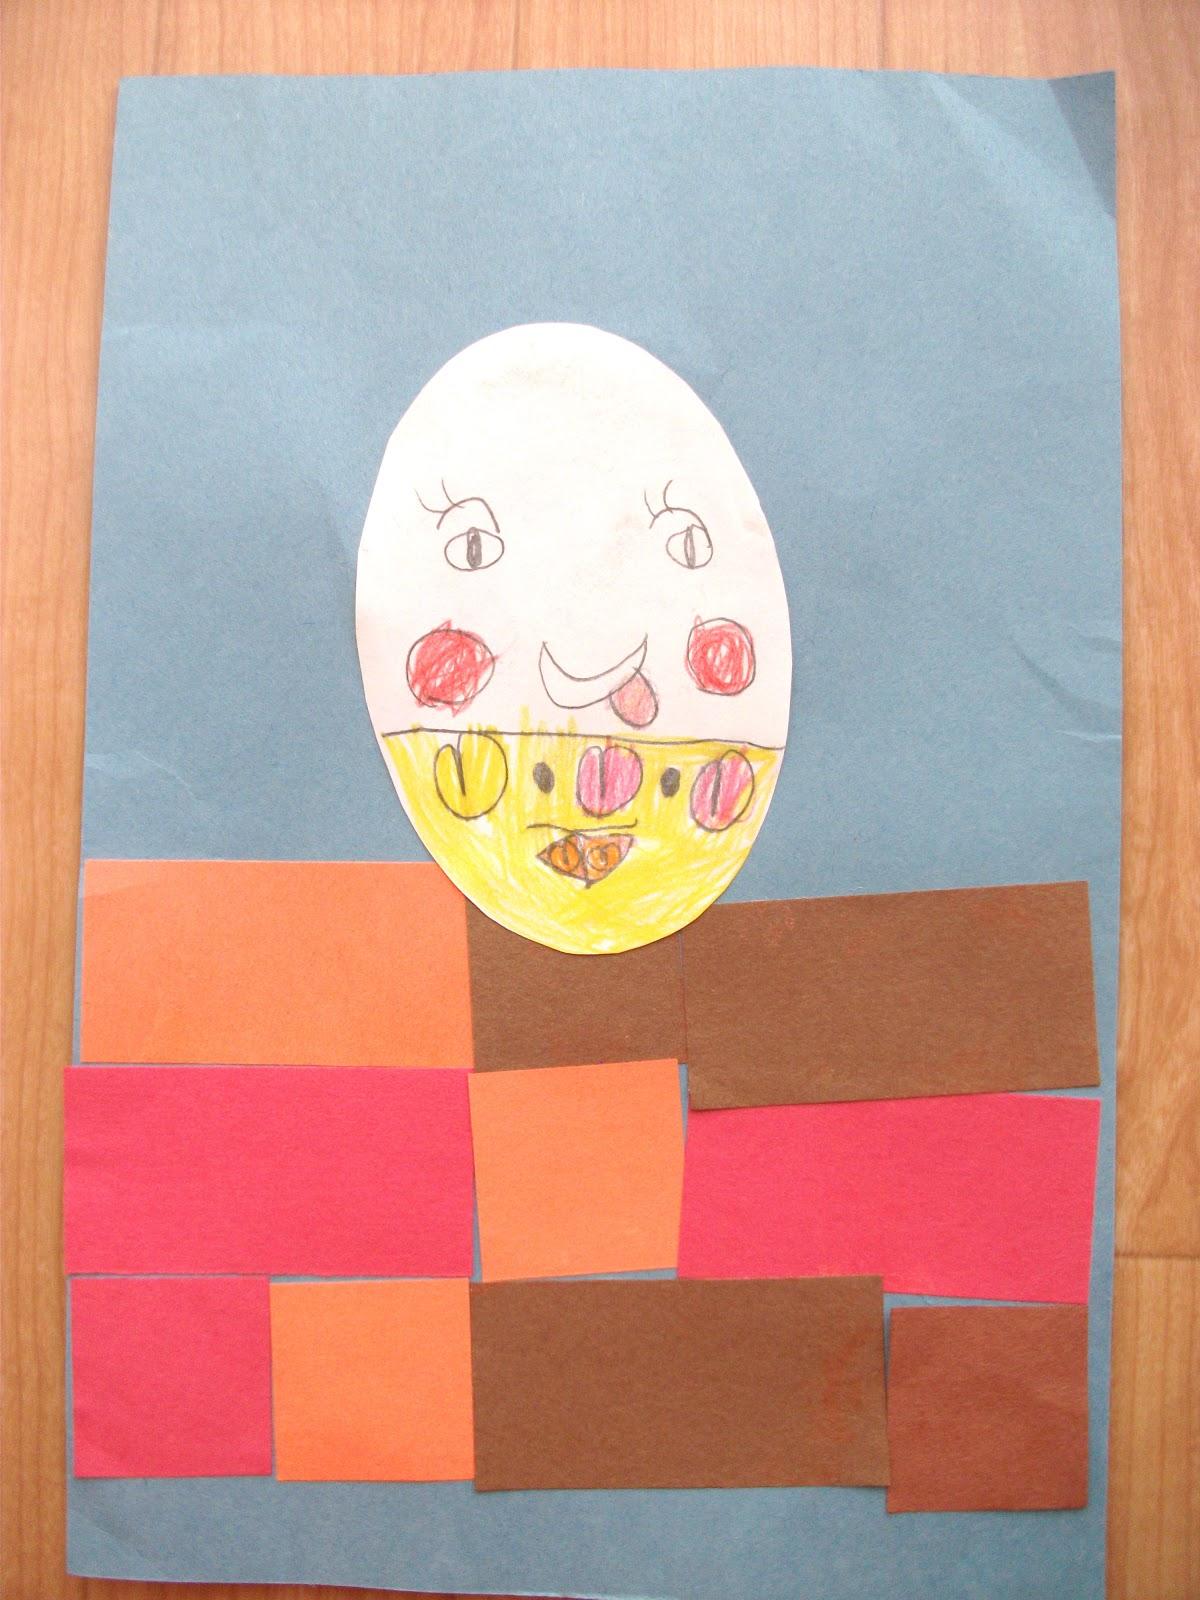 Preschool Crafts For Kids Humpty Dumpty Craft